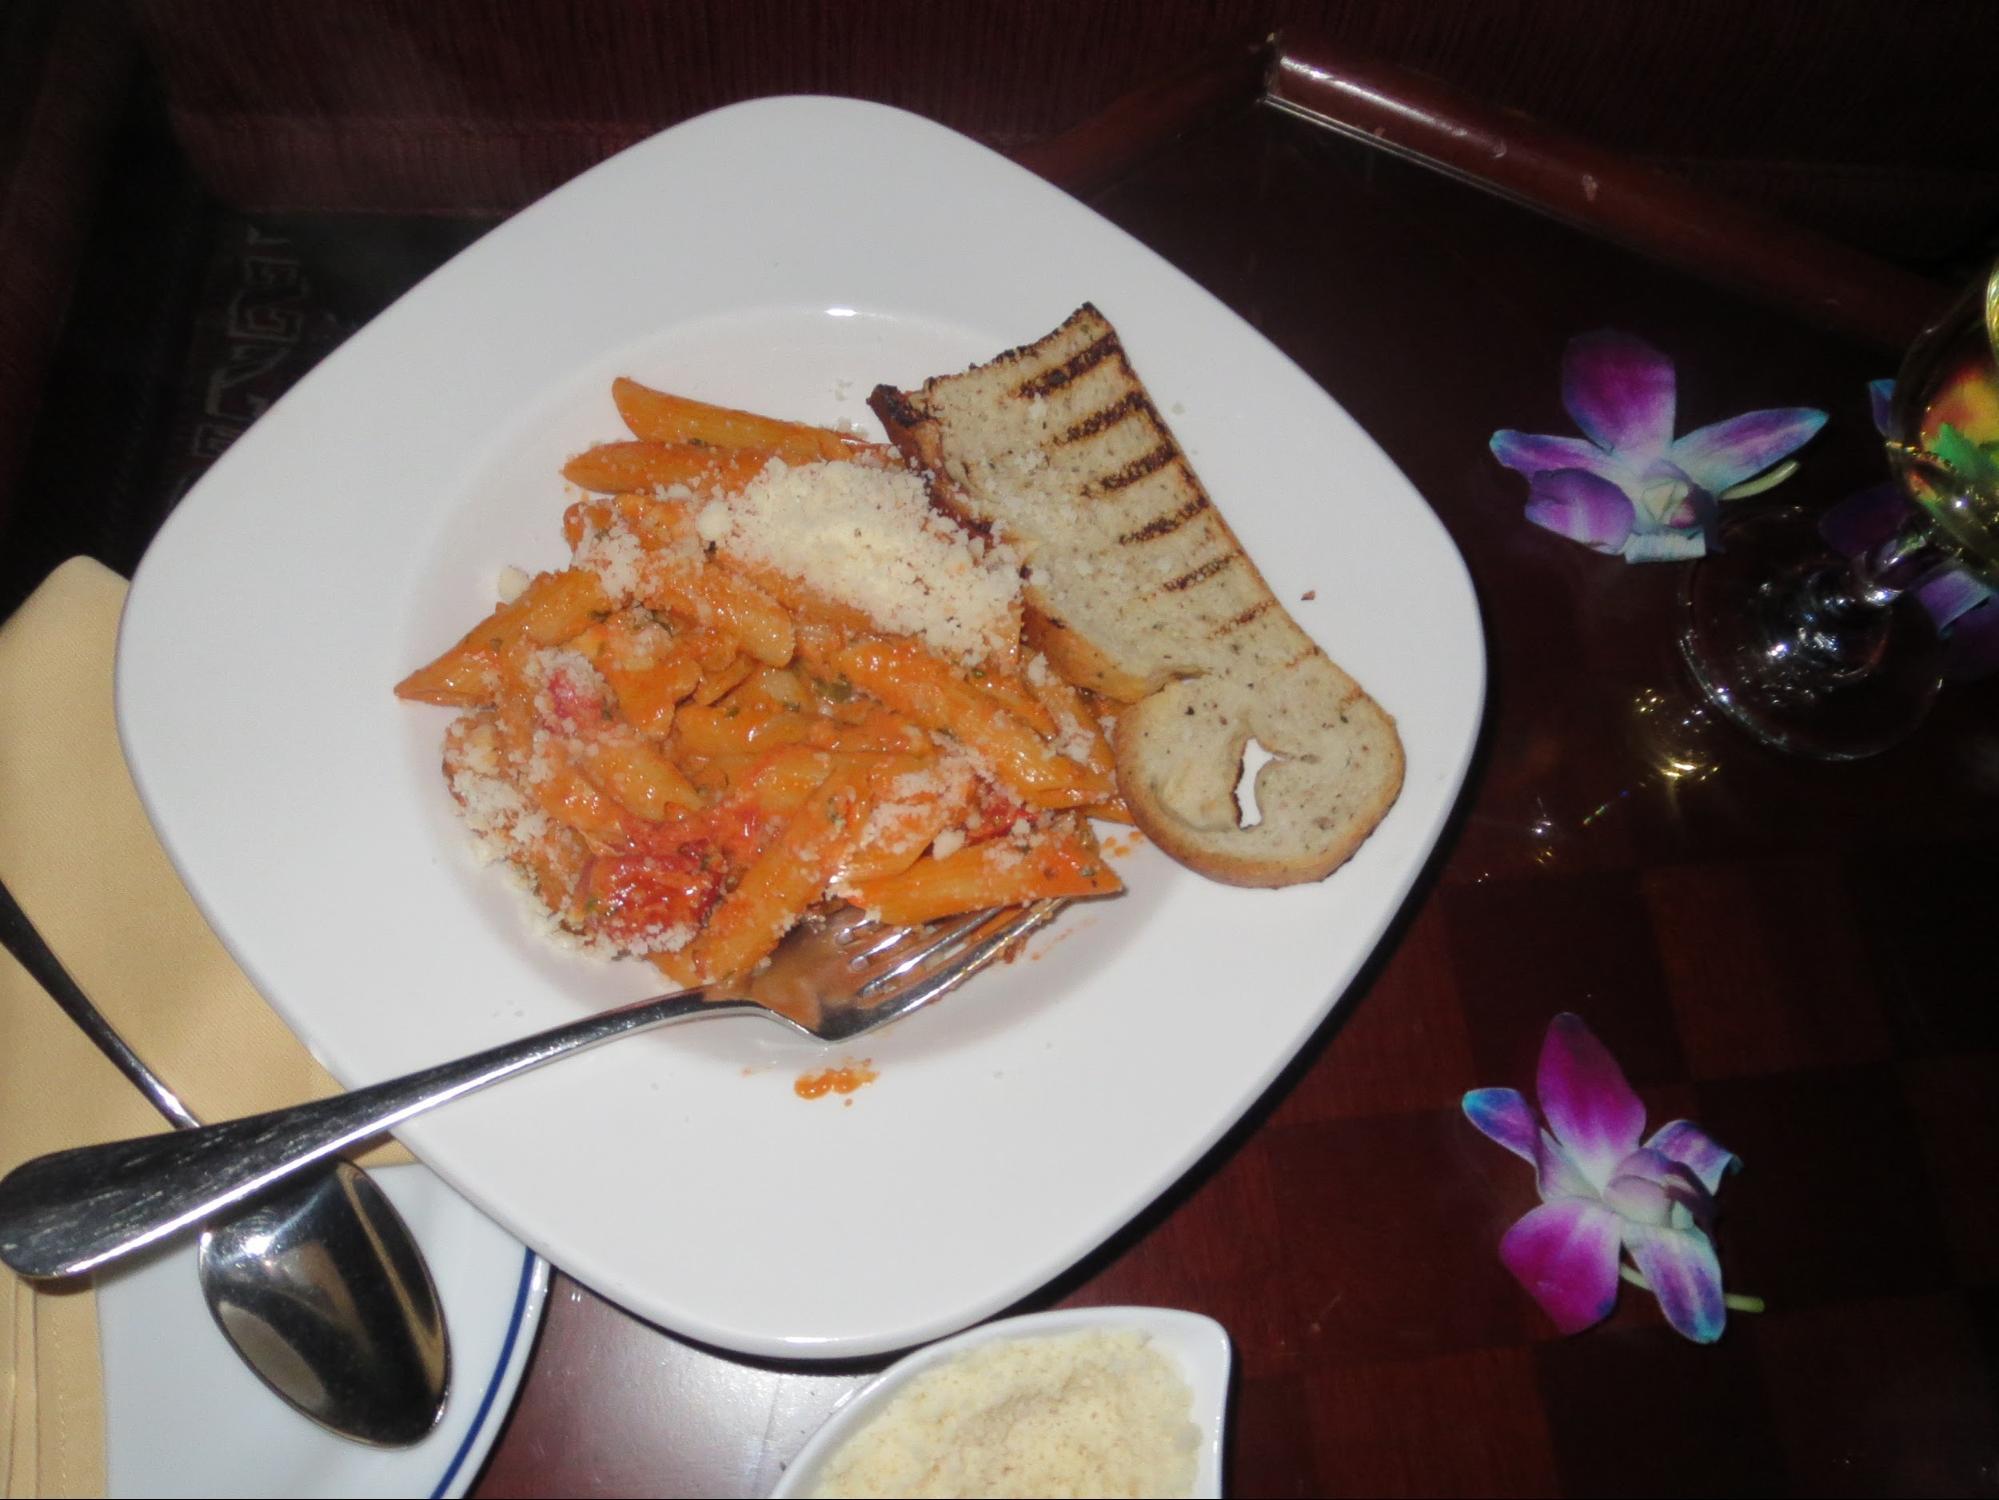 Kempinski Hotel, Ajman Review - Candle Light Dinner at Balcony